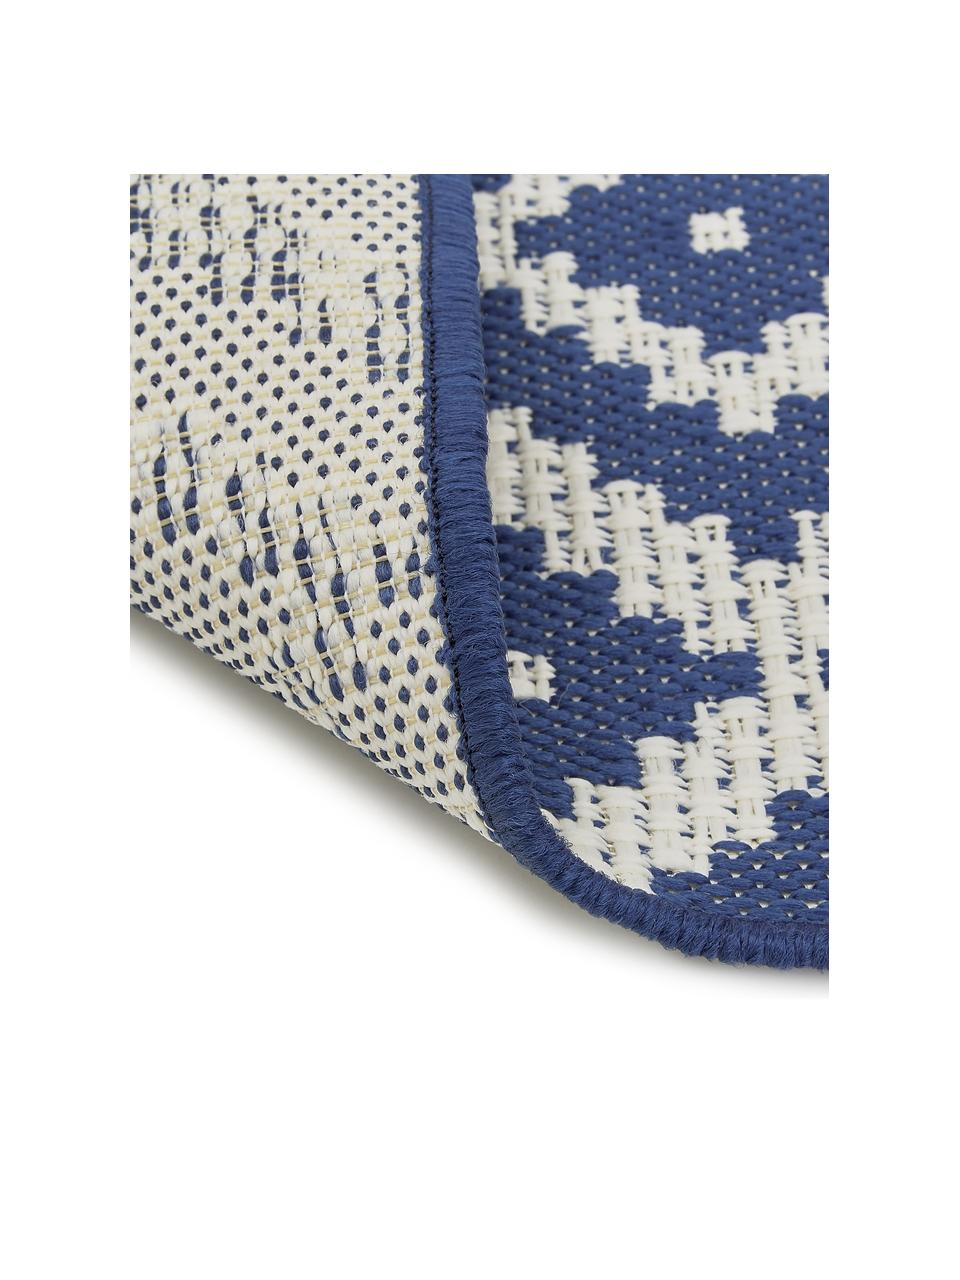 Passatoia blu/bianca a fantasia da interno-esterno Miami, 86% polipropilene, 14% poliestere, Bianco crema, blu, Larg. 80 x Lung. 250 cm